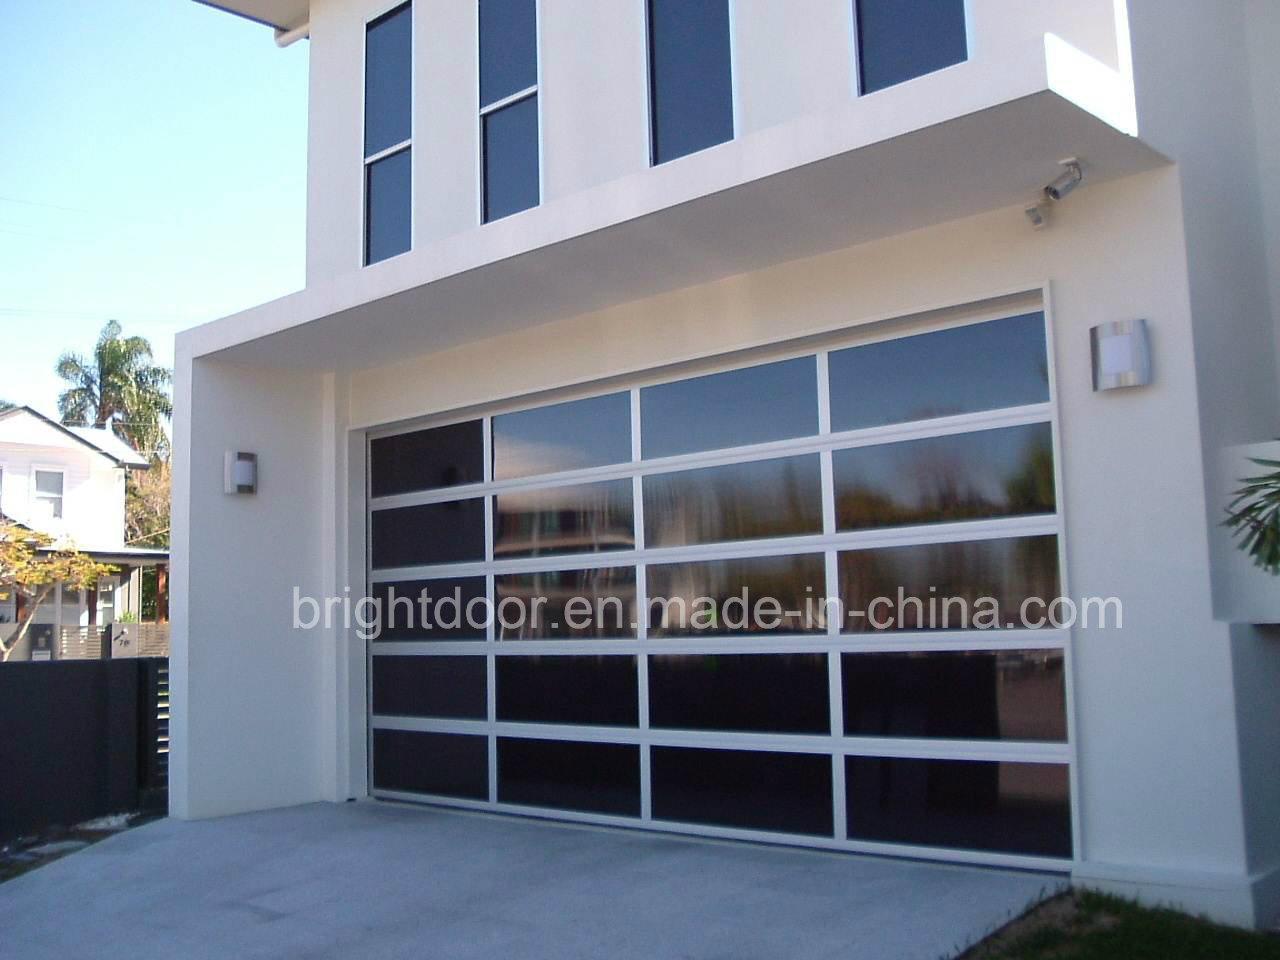 China Contemporary Glass Aluminum Garage Doors China Garage Door Contemporary Glass Garage Door